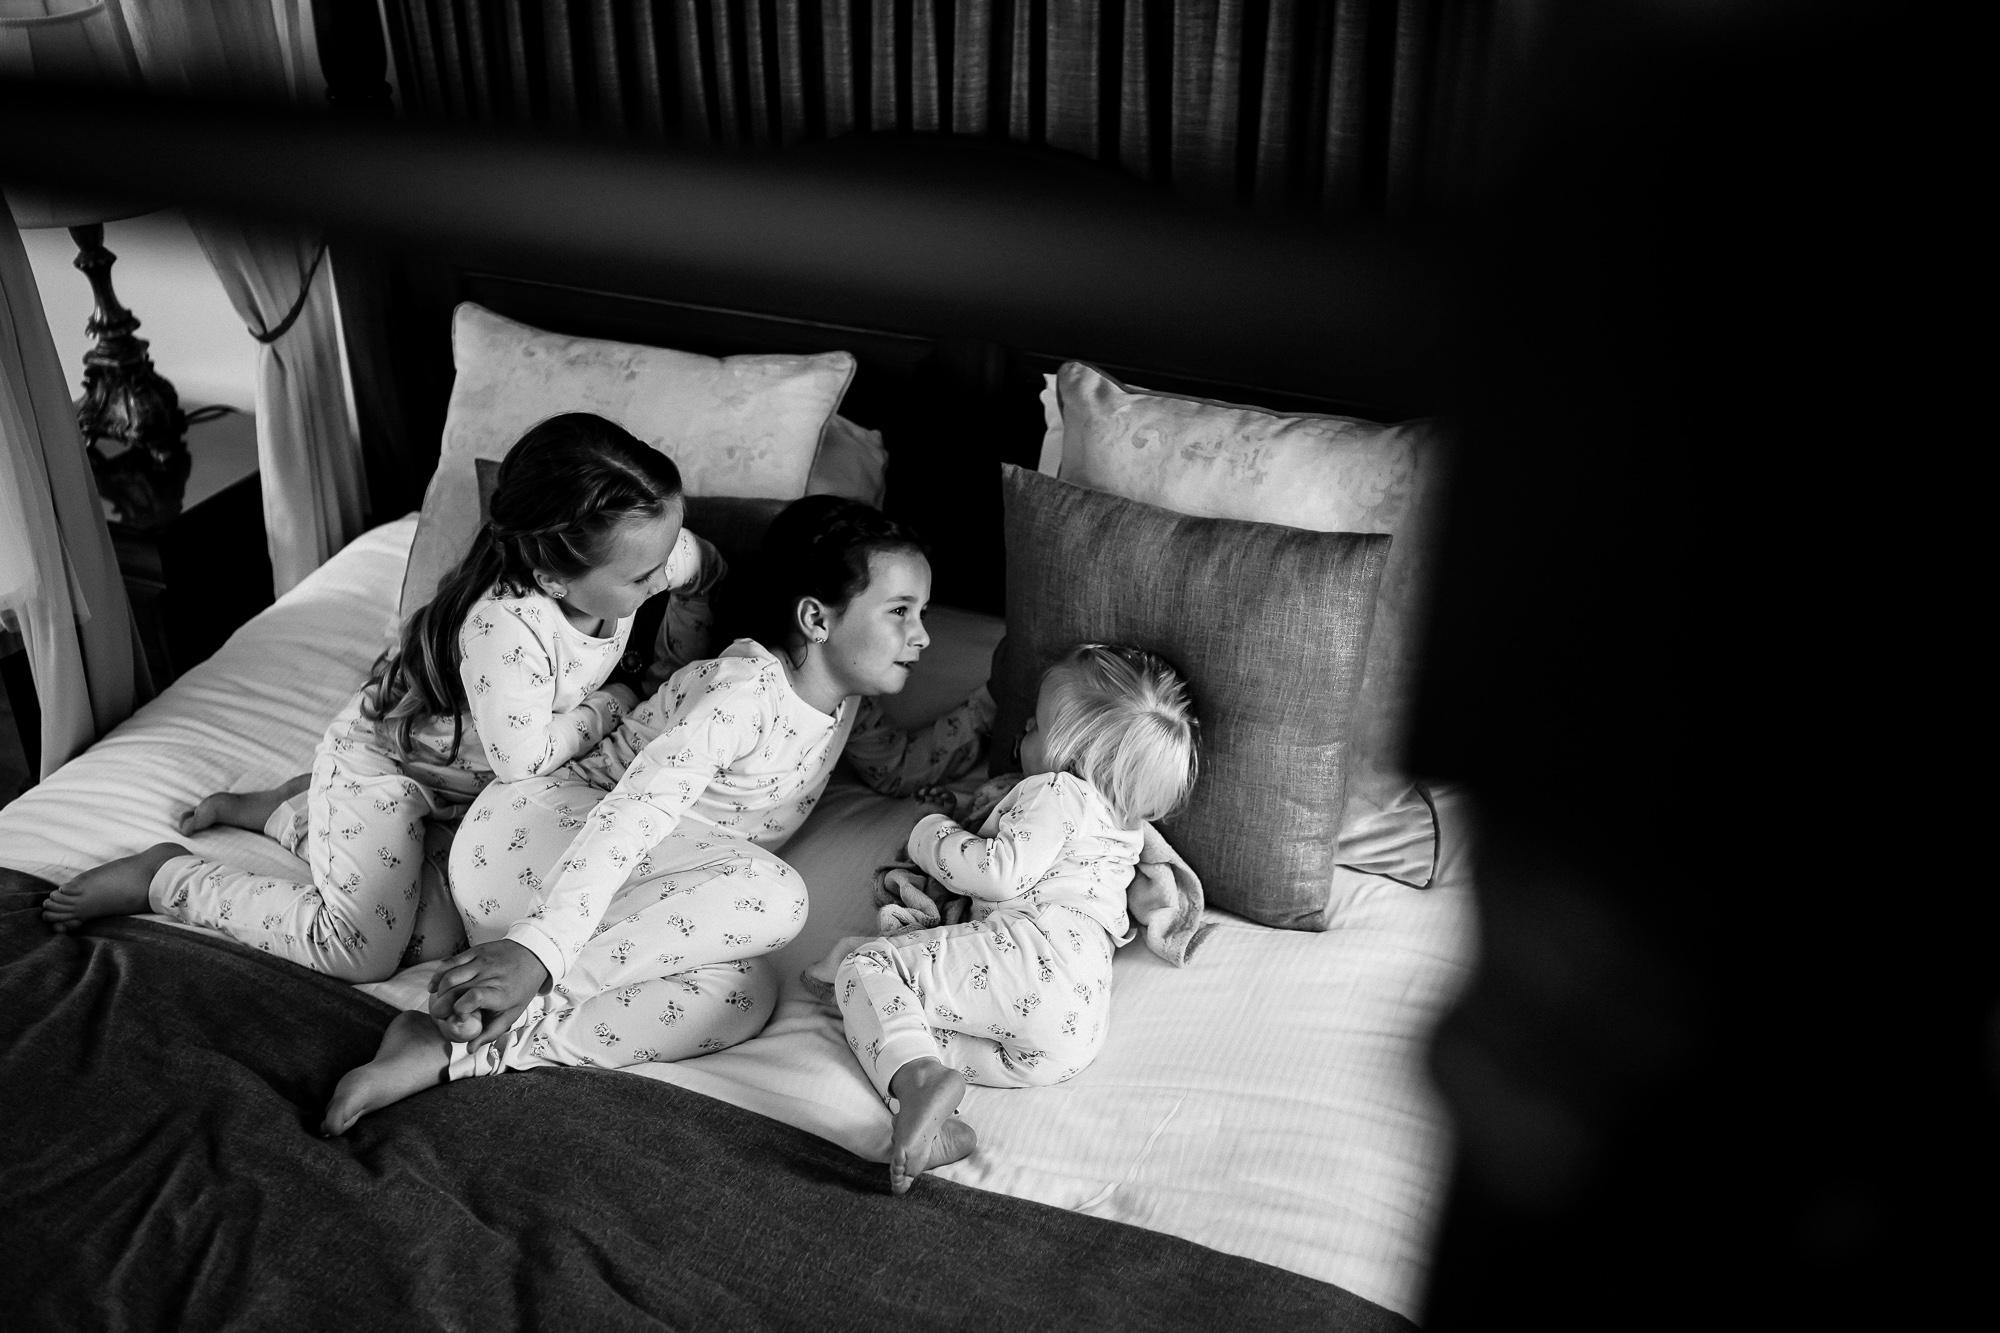 West Tower Wedding Photographer Ormskirk Lancashire wedding photography (9 of 57).jpg